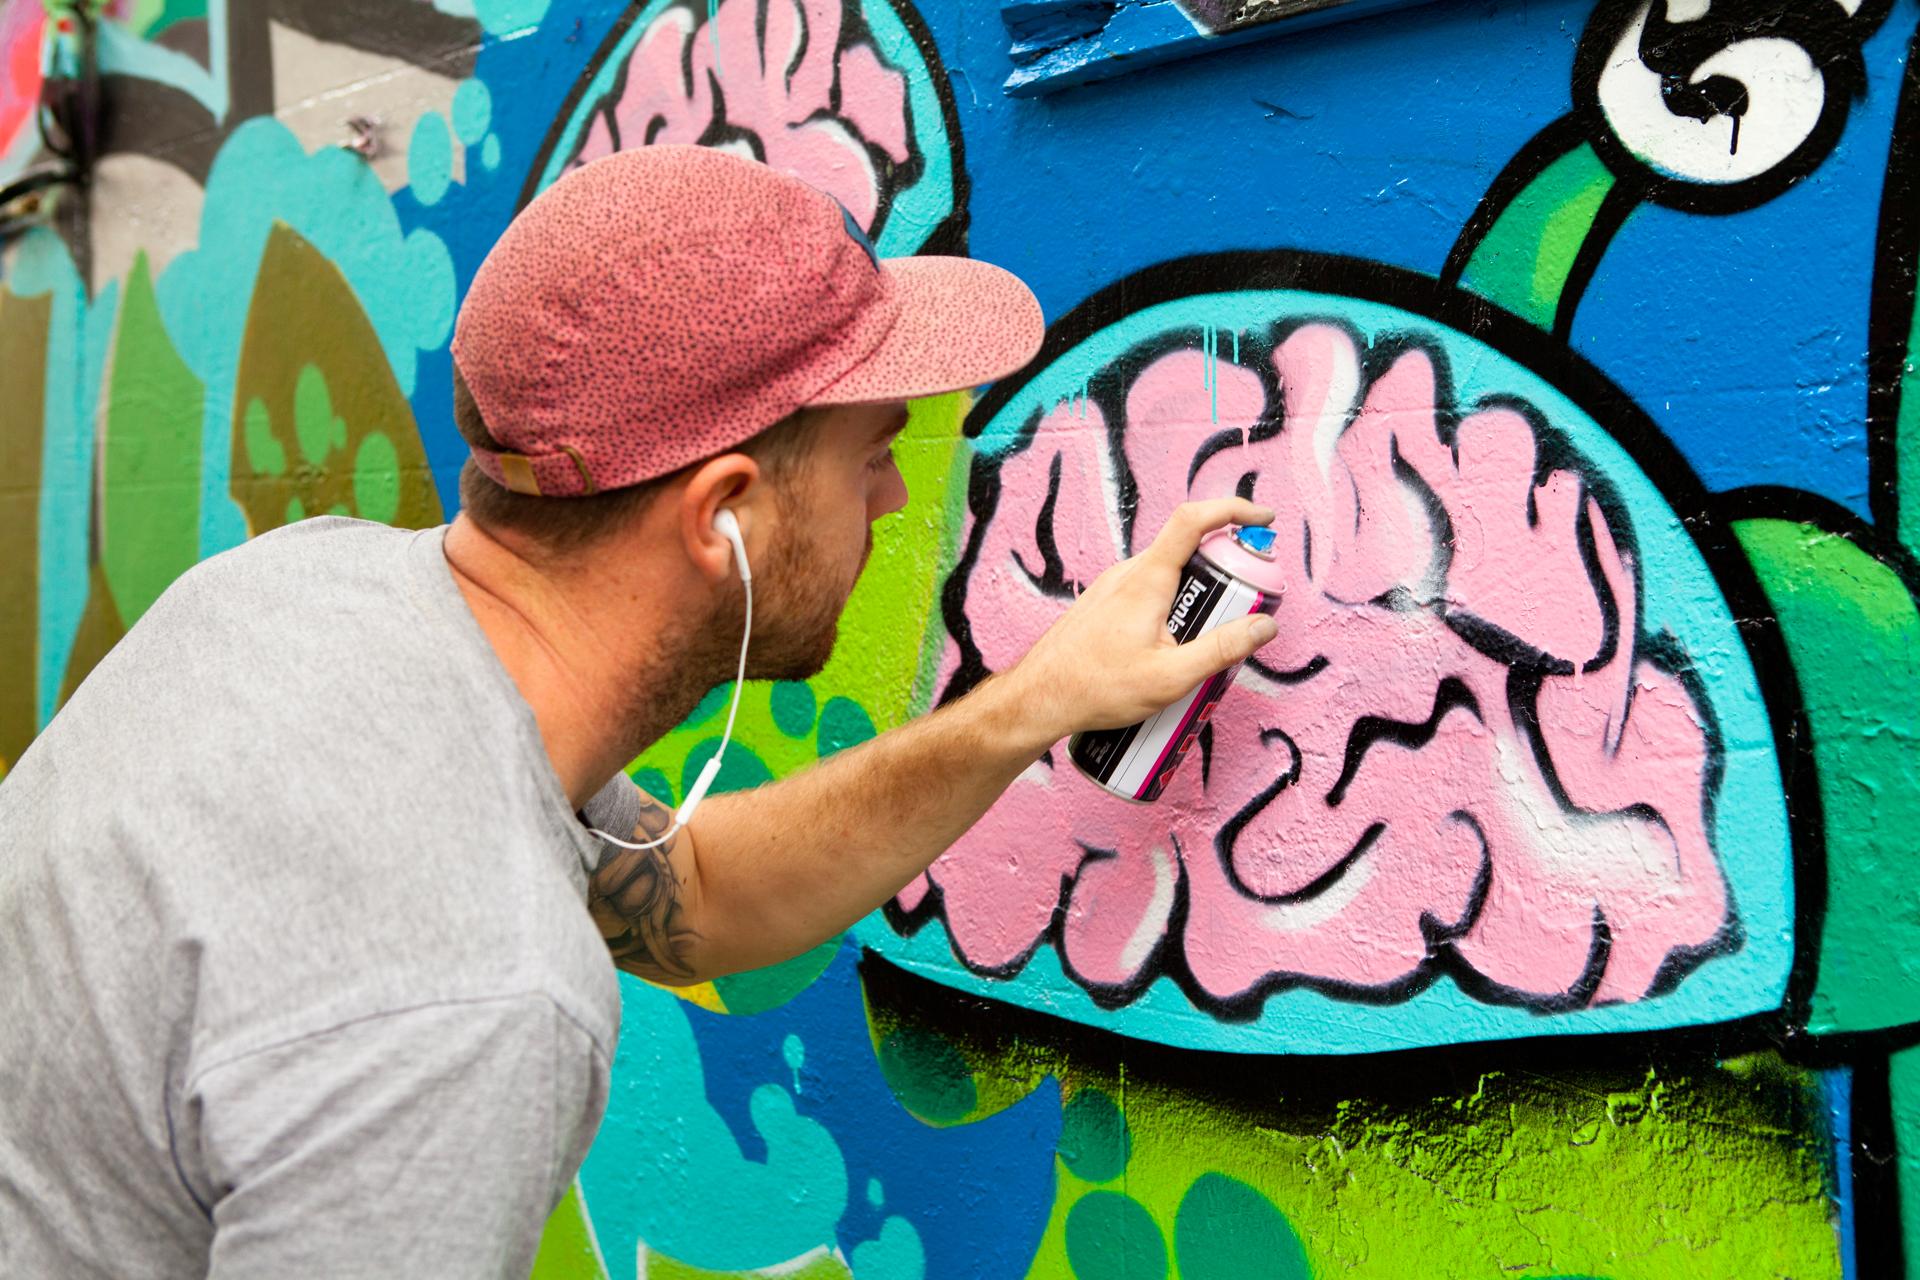 Man doing graffiit art with a spray paint can